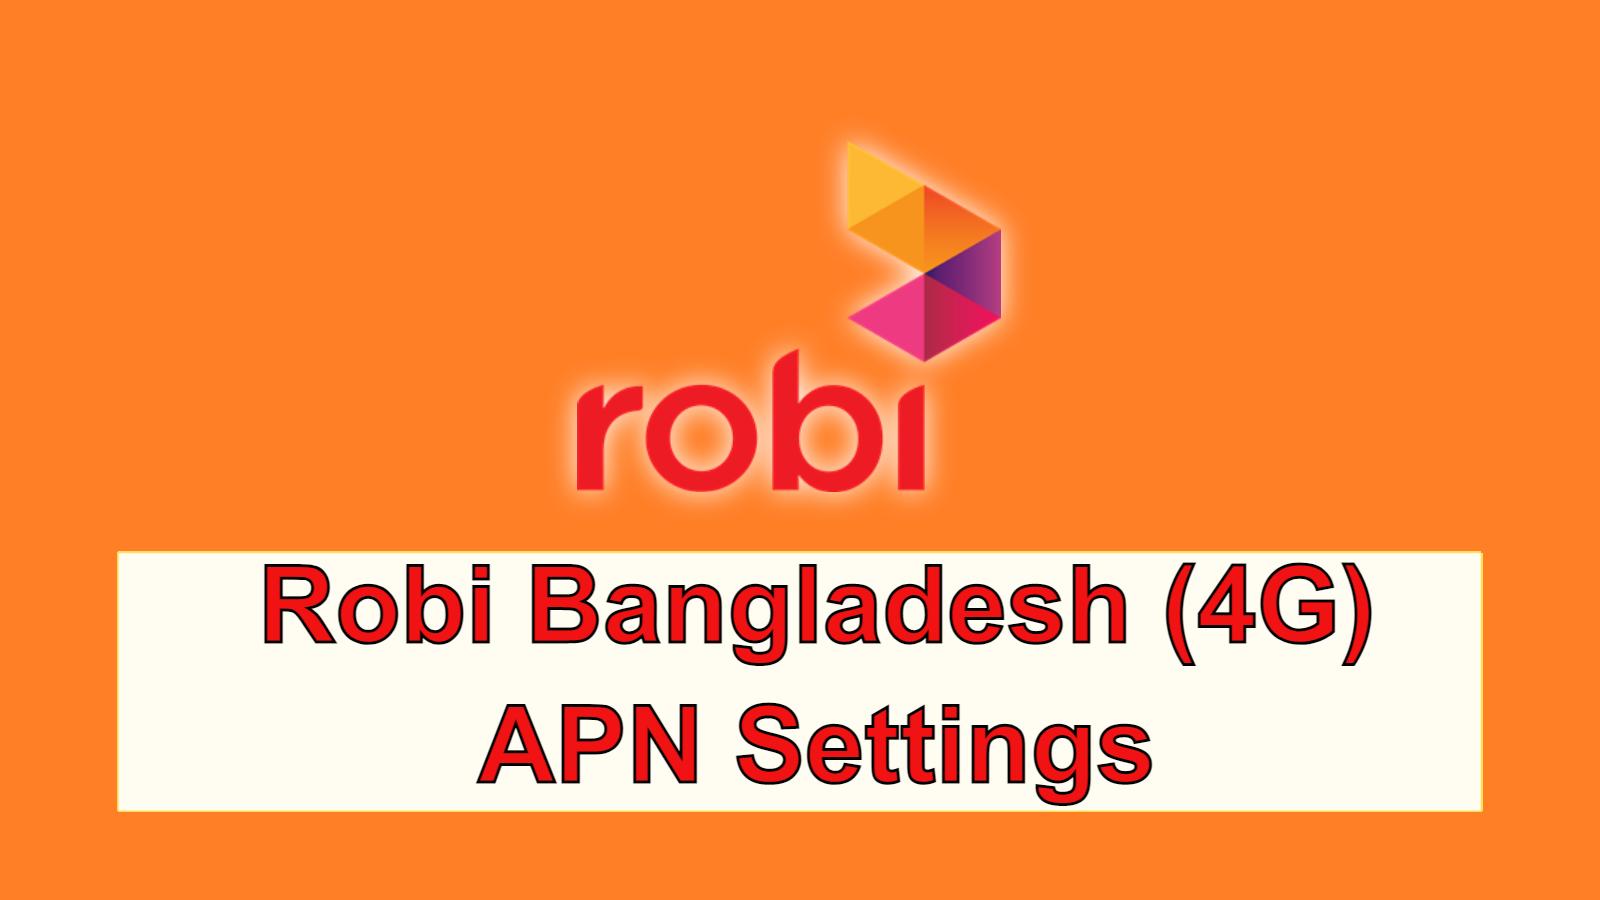 Robi Bangladesh (4G) APN Settings